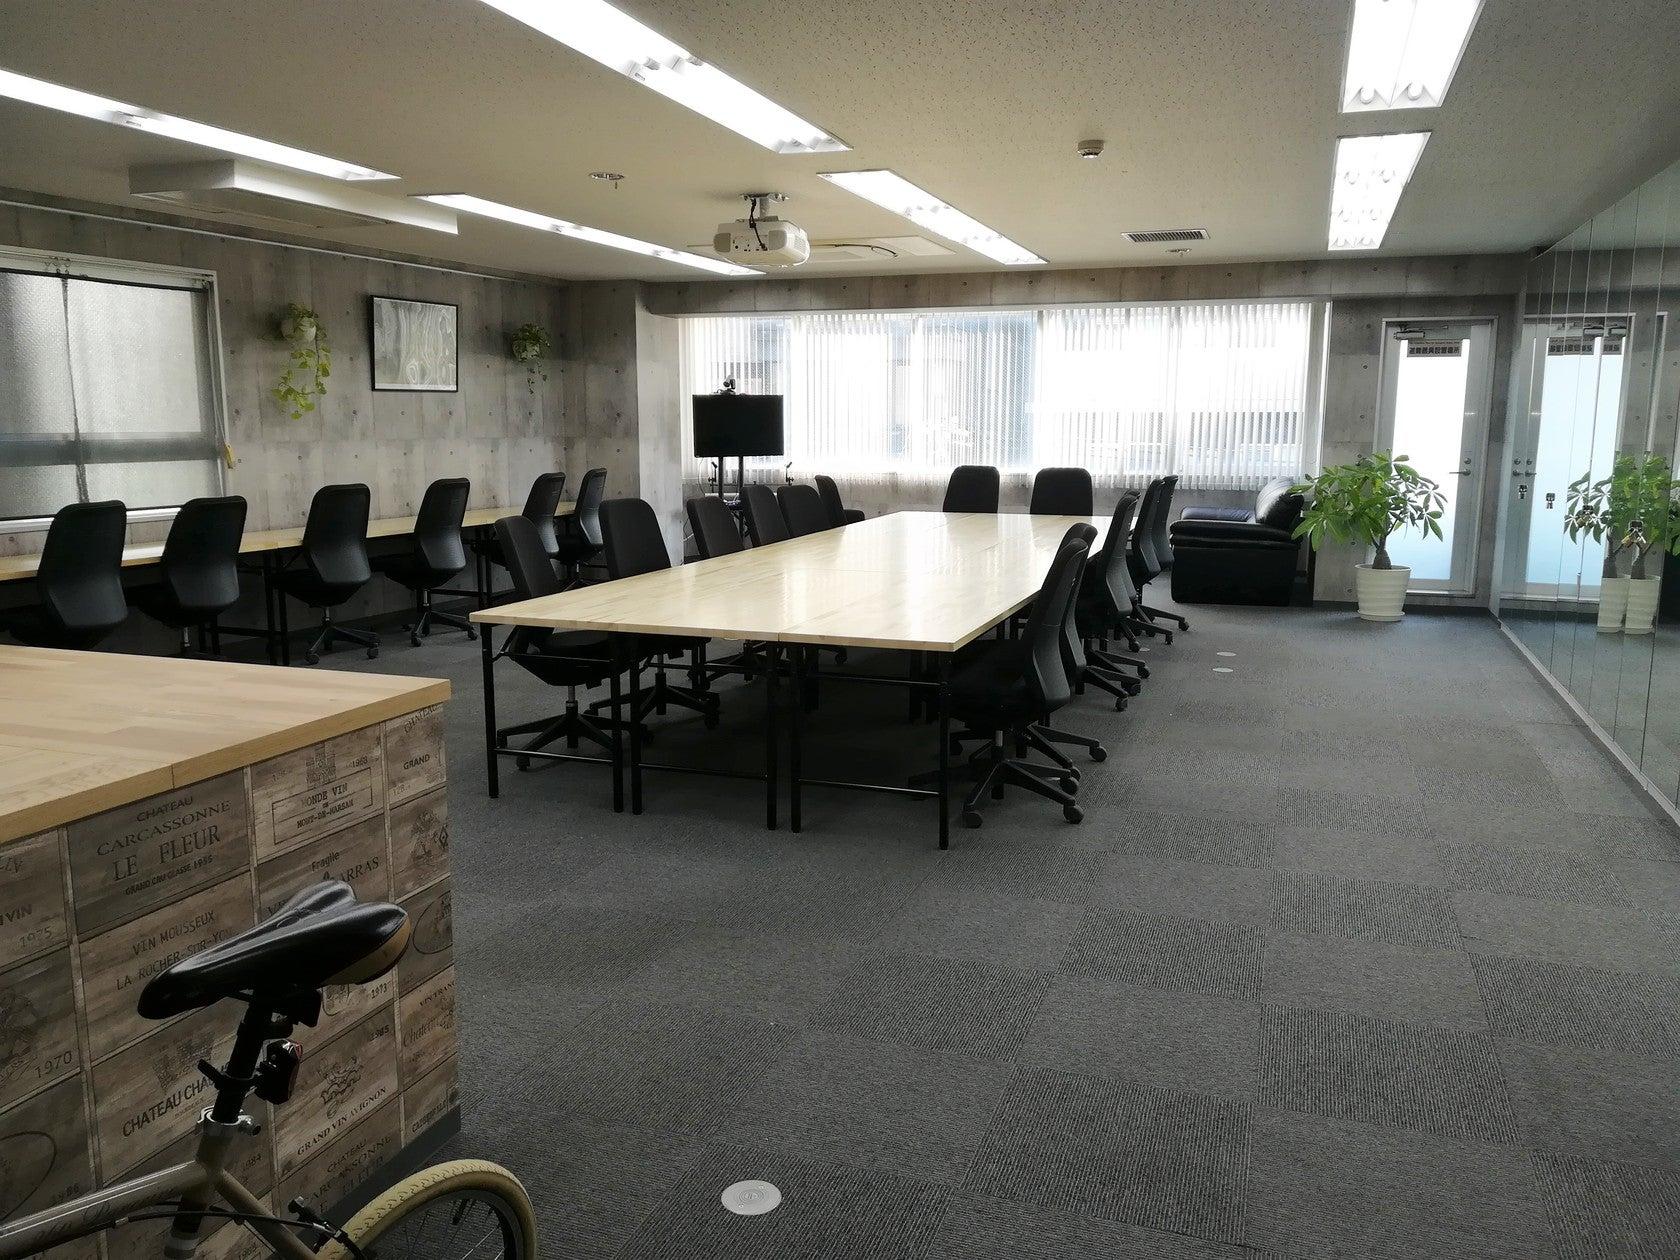 Web会議や大型スクリーンで映画鑑賞も…多様に使えるミーティングスペース demokura